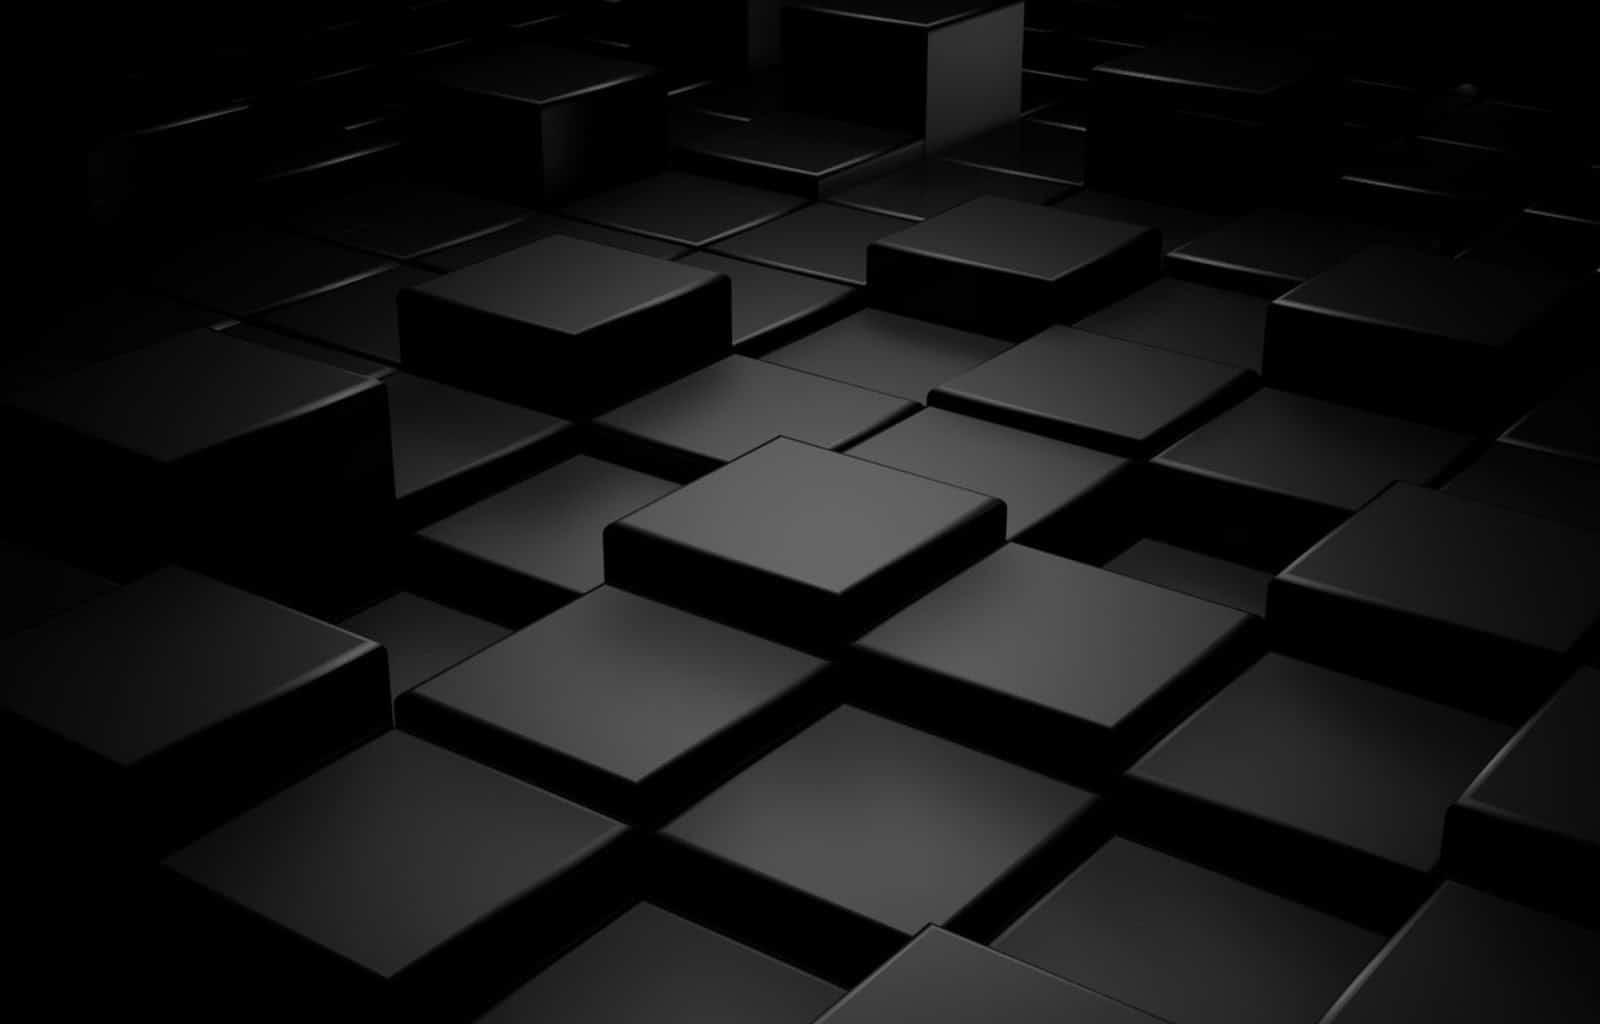 Block HD Wallpapers 23